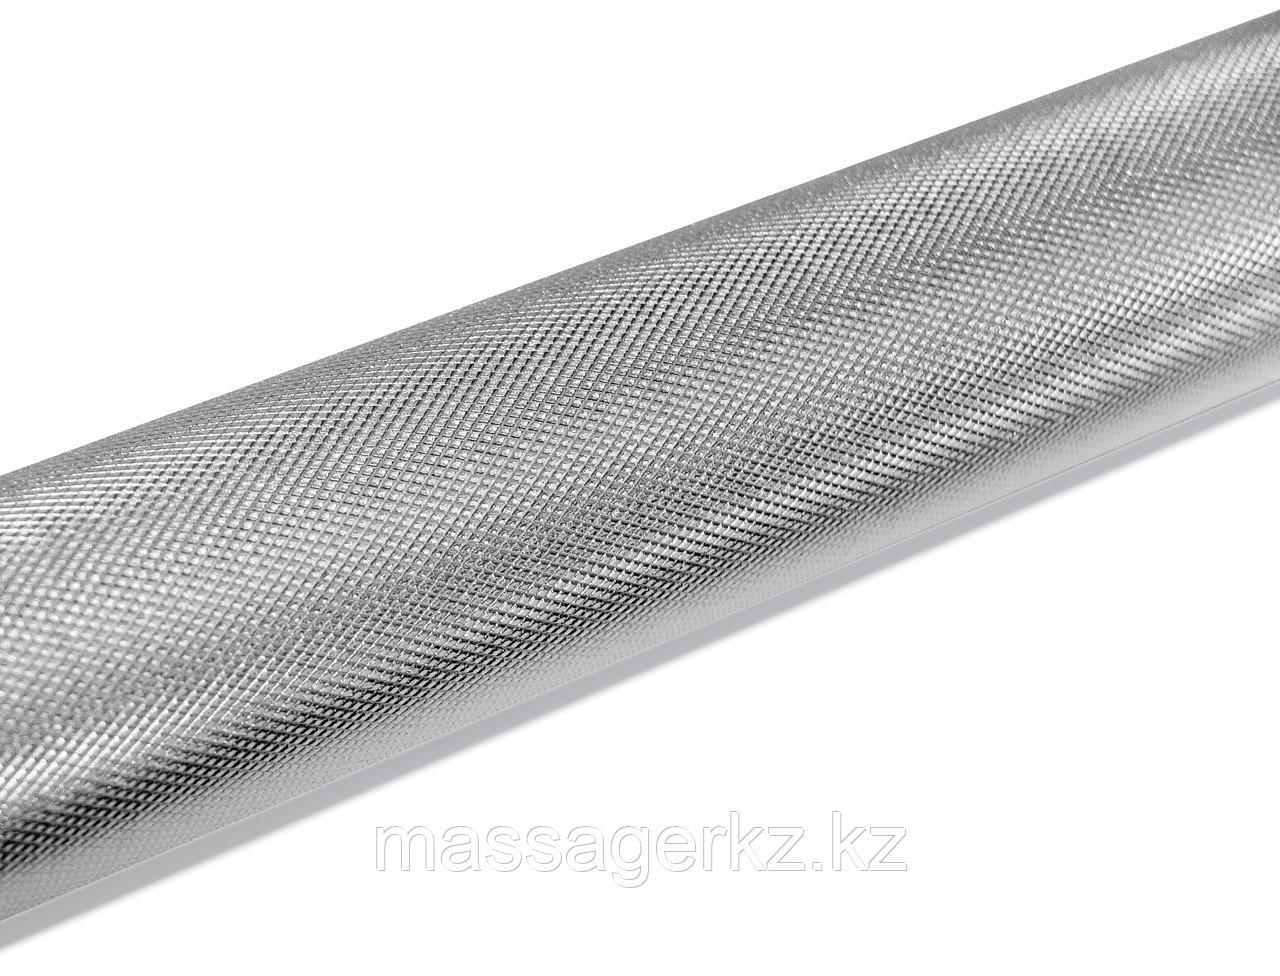 Рукоятка для тяги за голову алюминиевая 122 см - фото 4